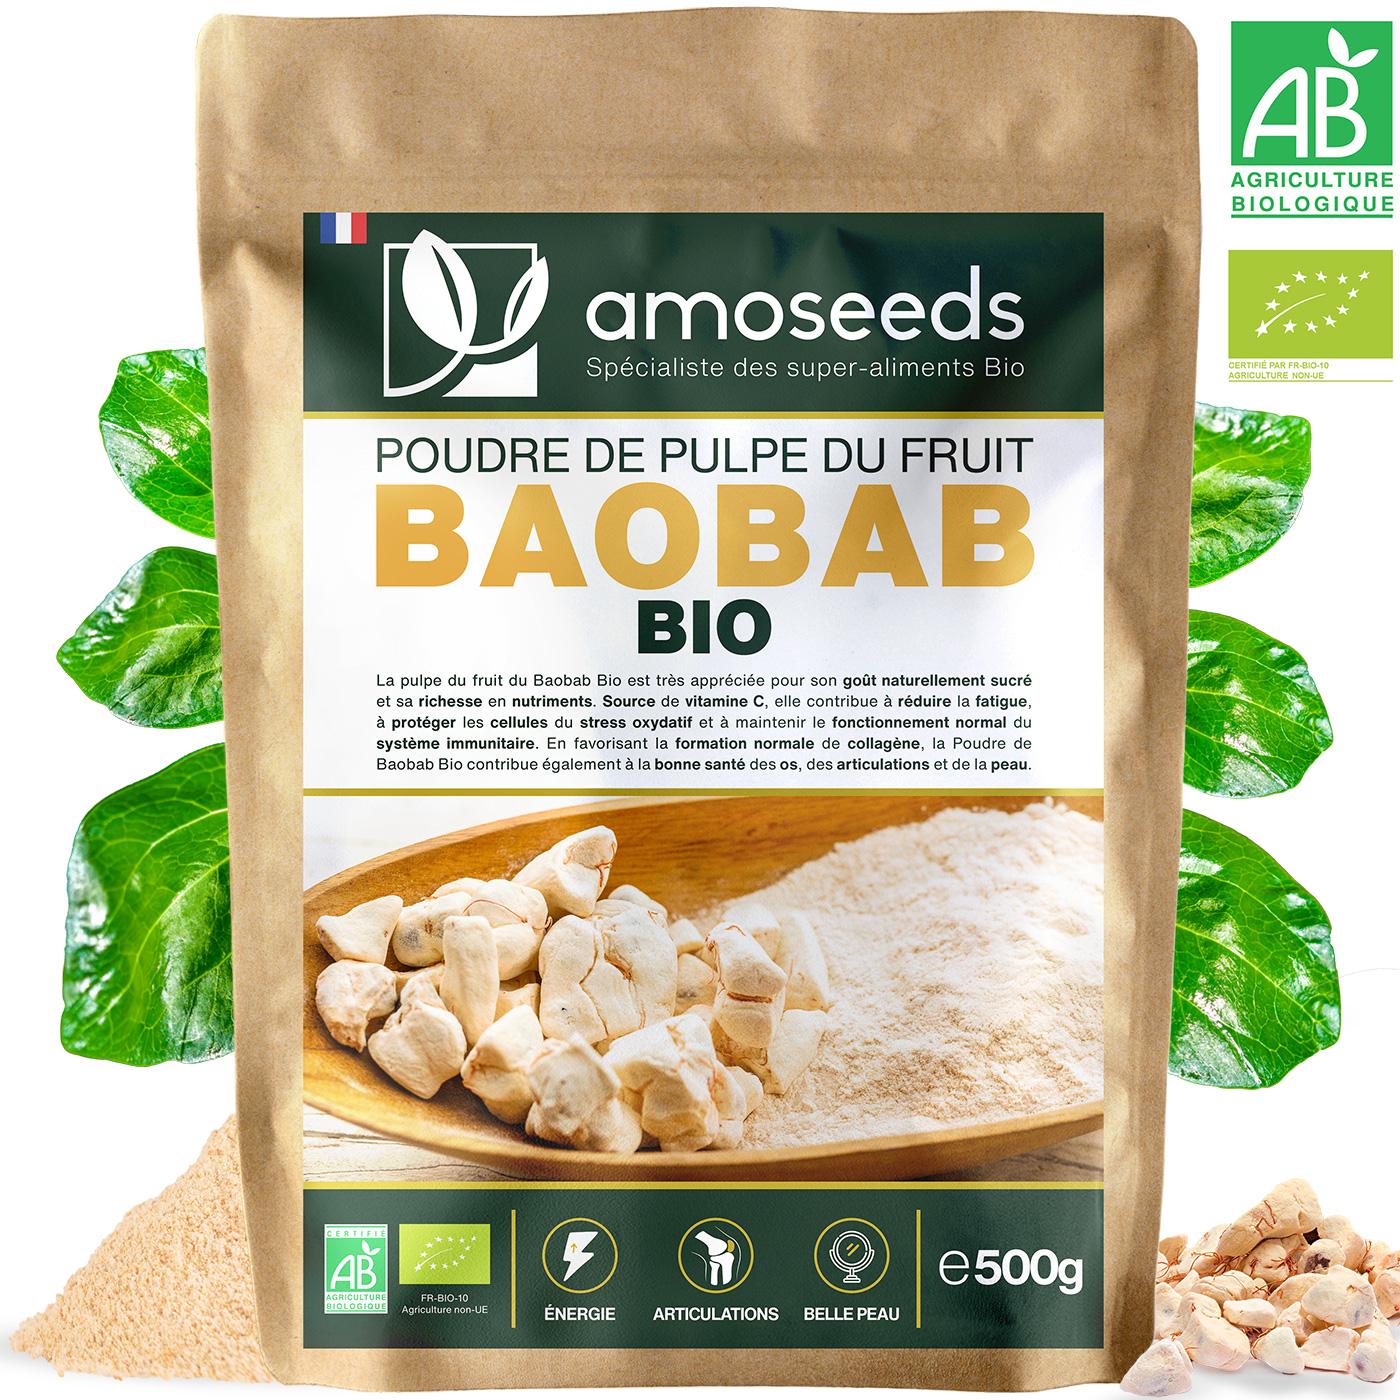 amoseeds - Poudre de Baobab Bio 500g